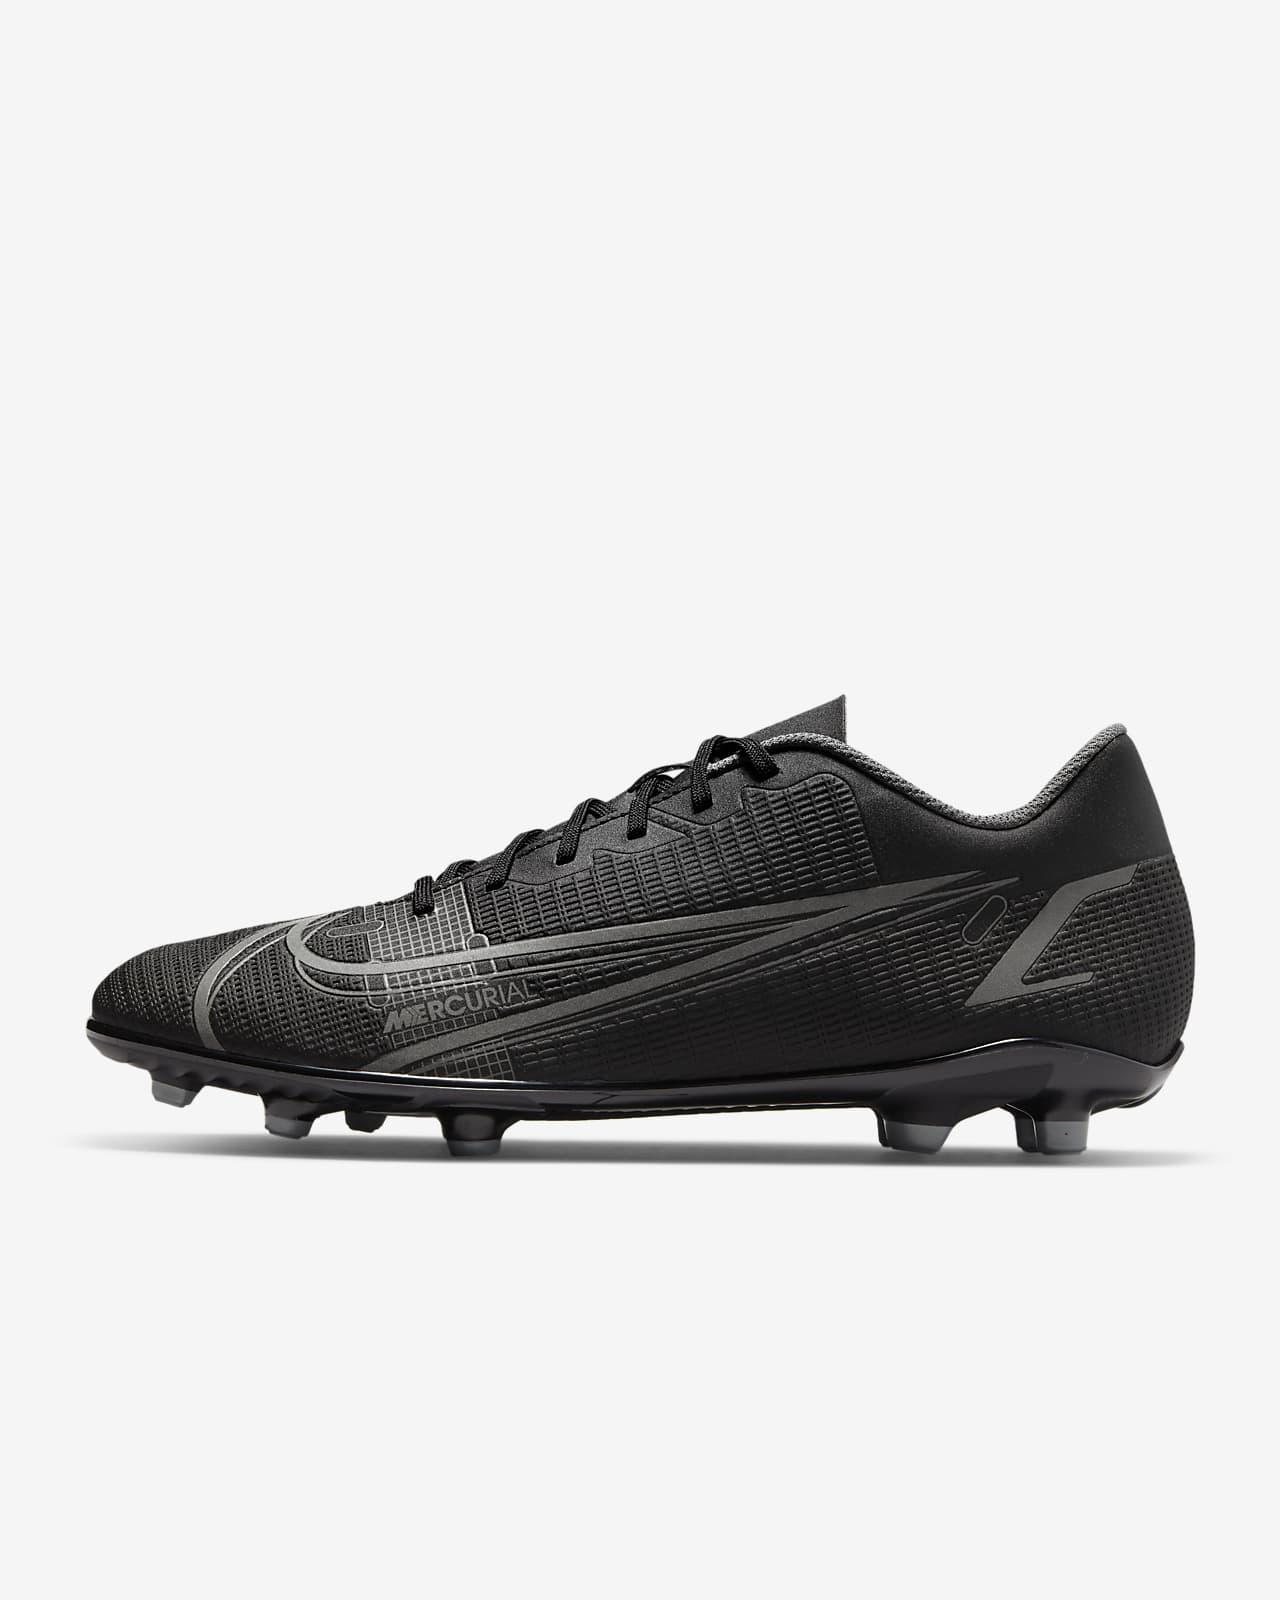 Nike Mercurial Vapor 14 Club FG/MG Multi-Ground Soccer Cleat